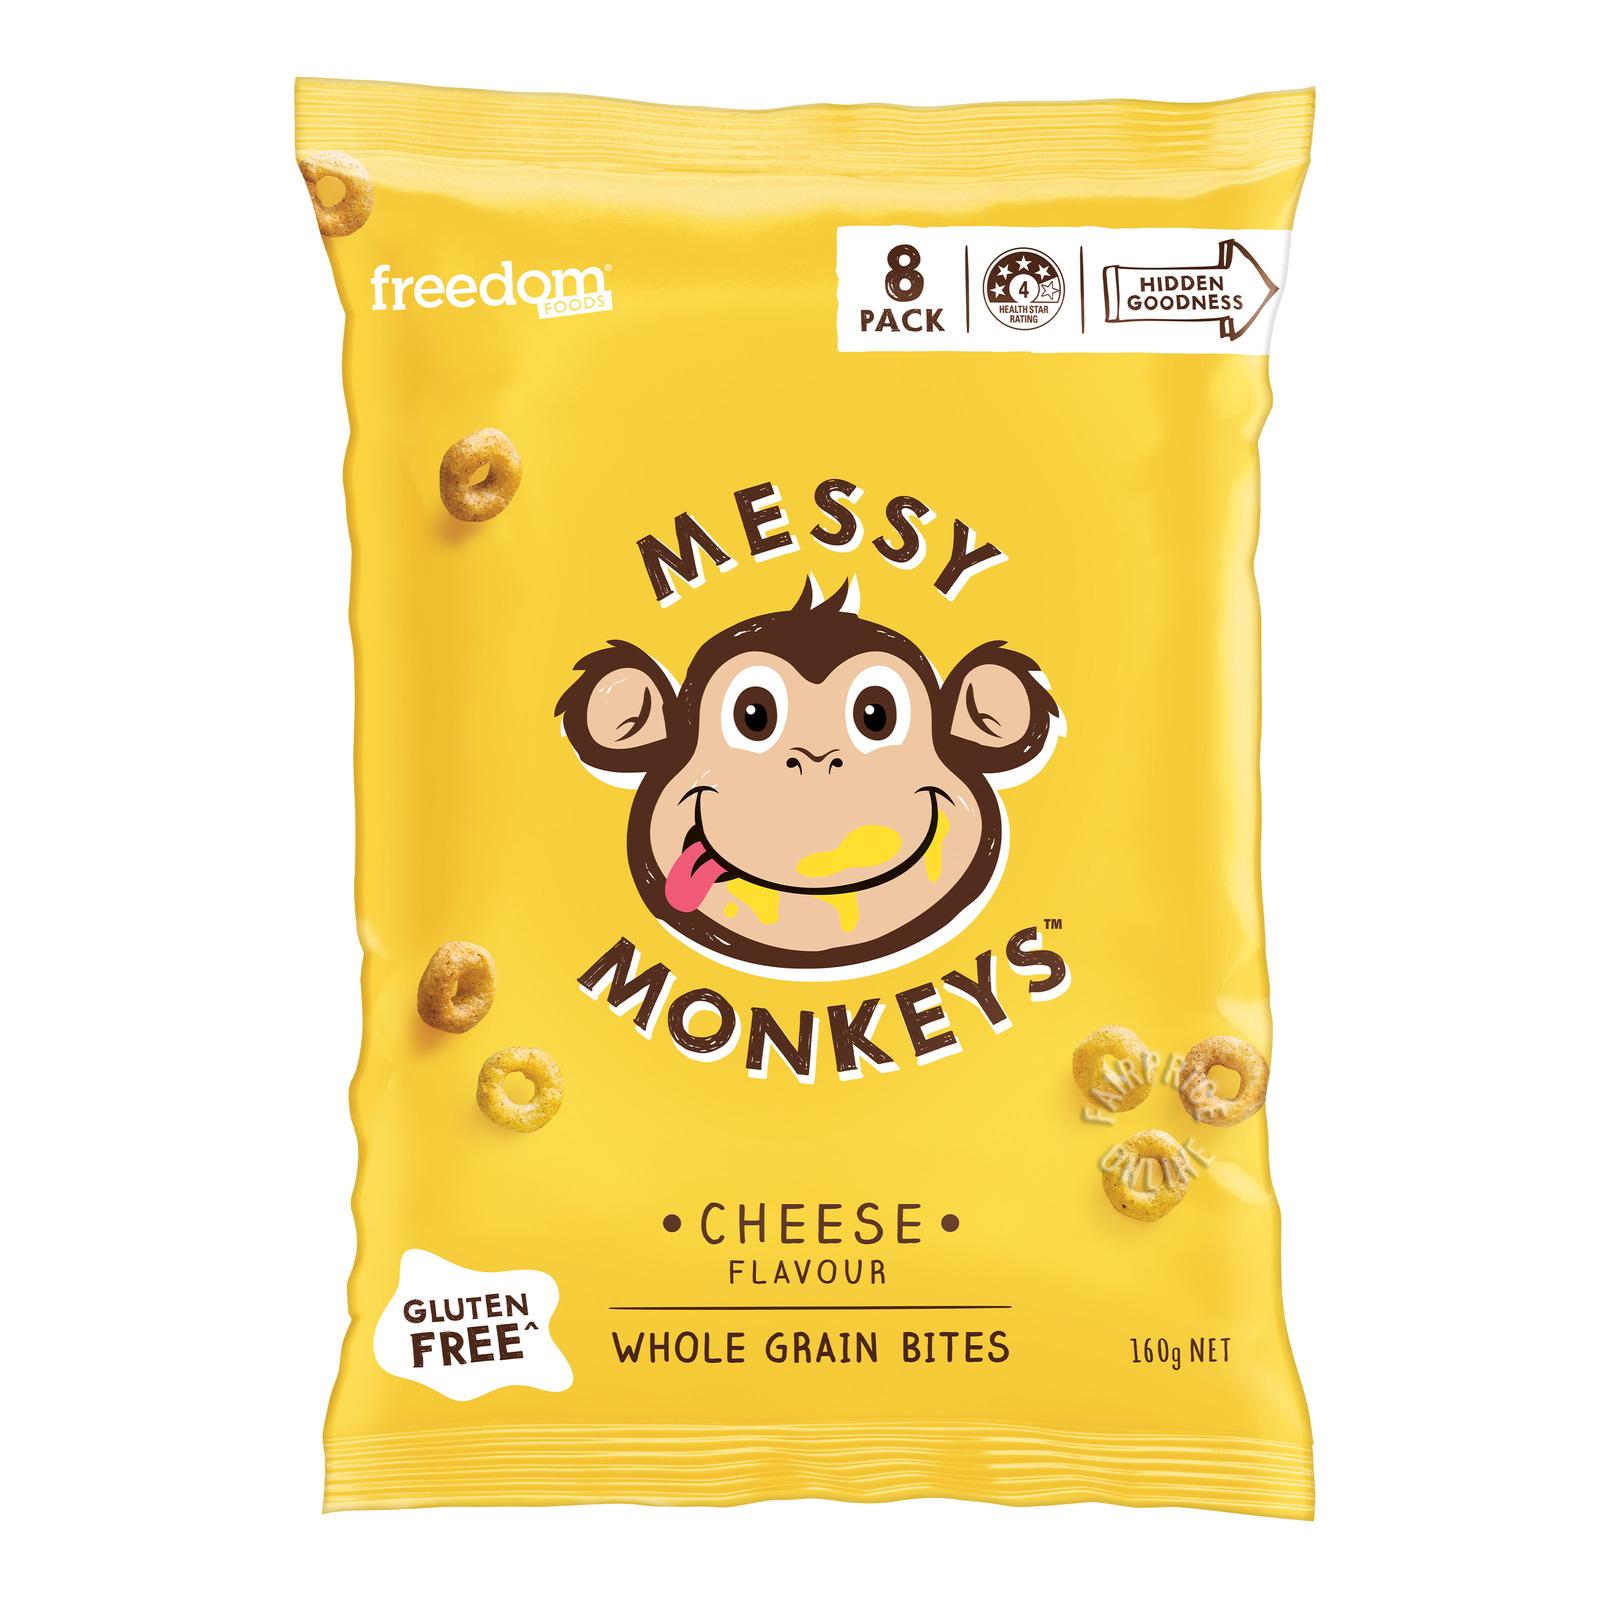 Freedom Foods Messy Monkeys Whole Grain Bites - Cheese